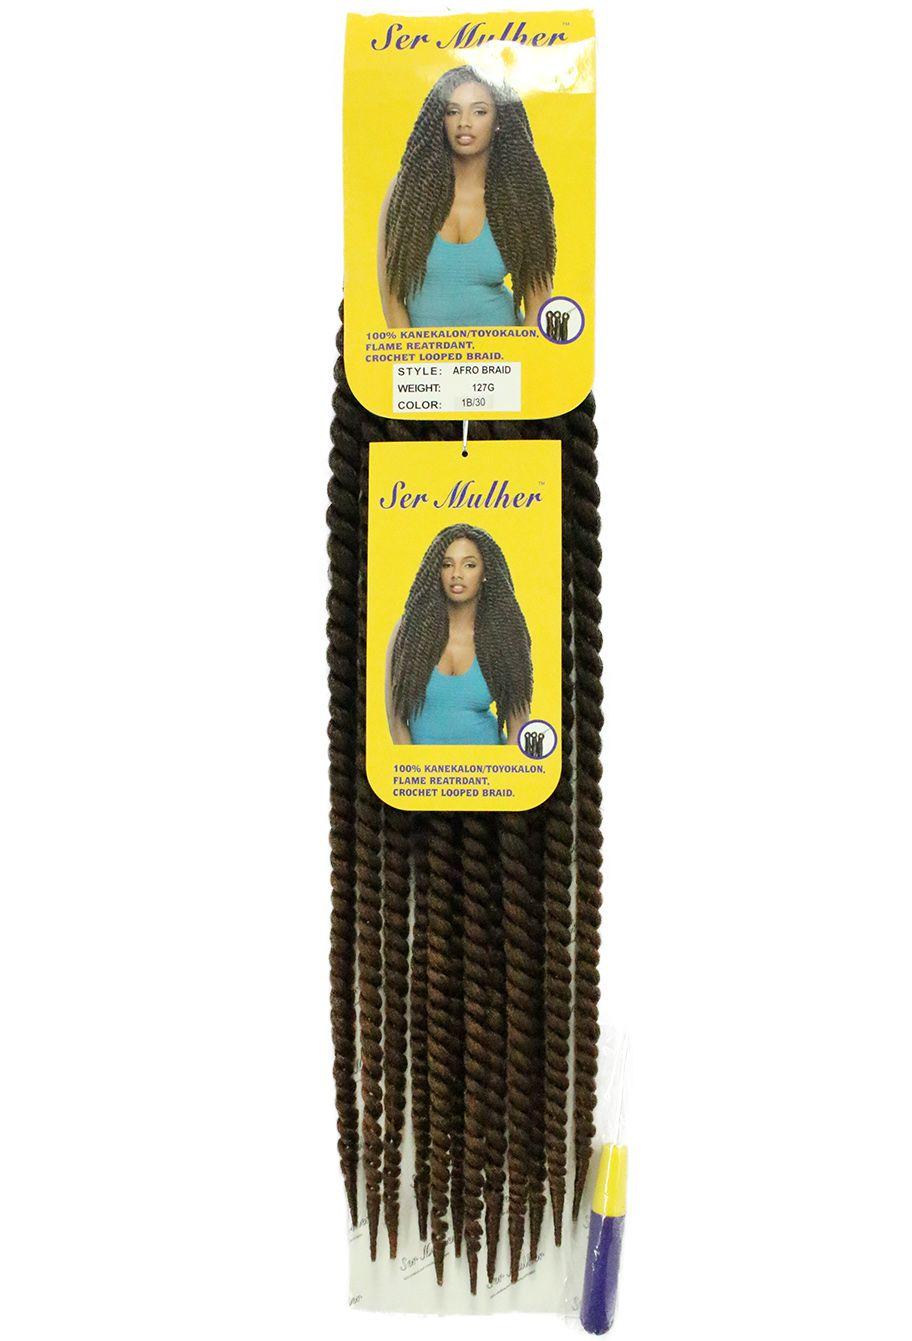 Cabelo Sintético - Ser Mulher - Twist Afro Braid